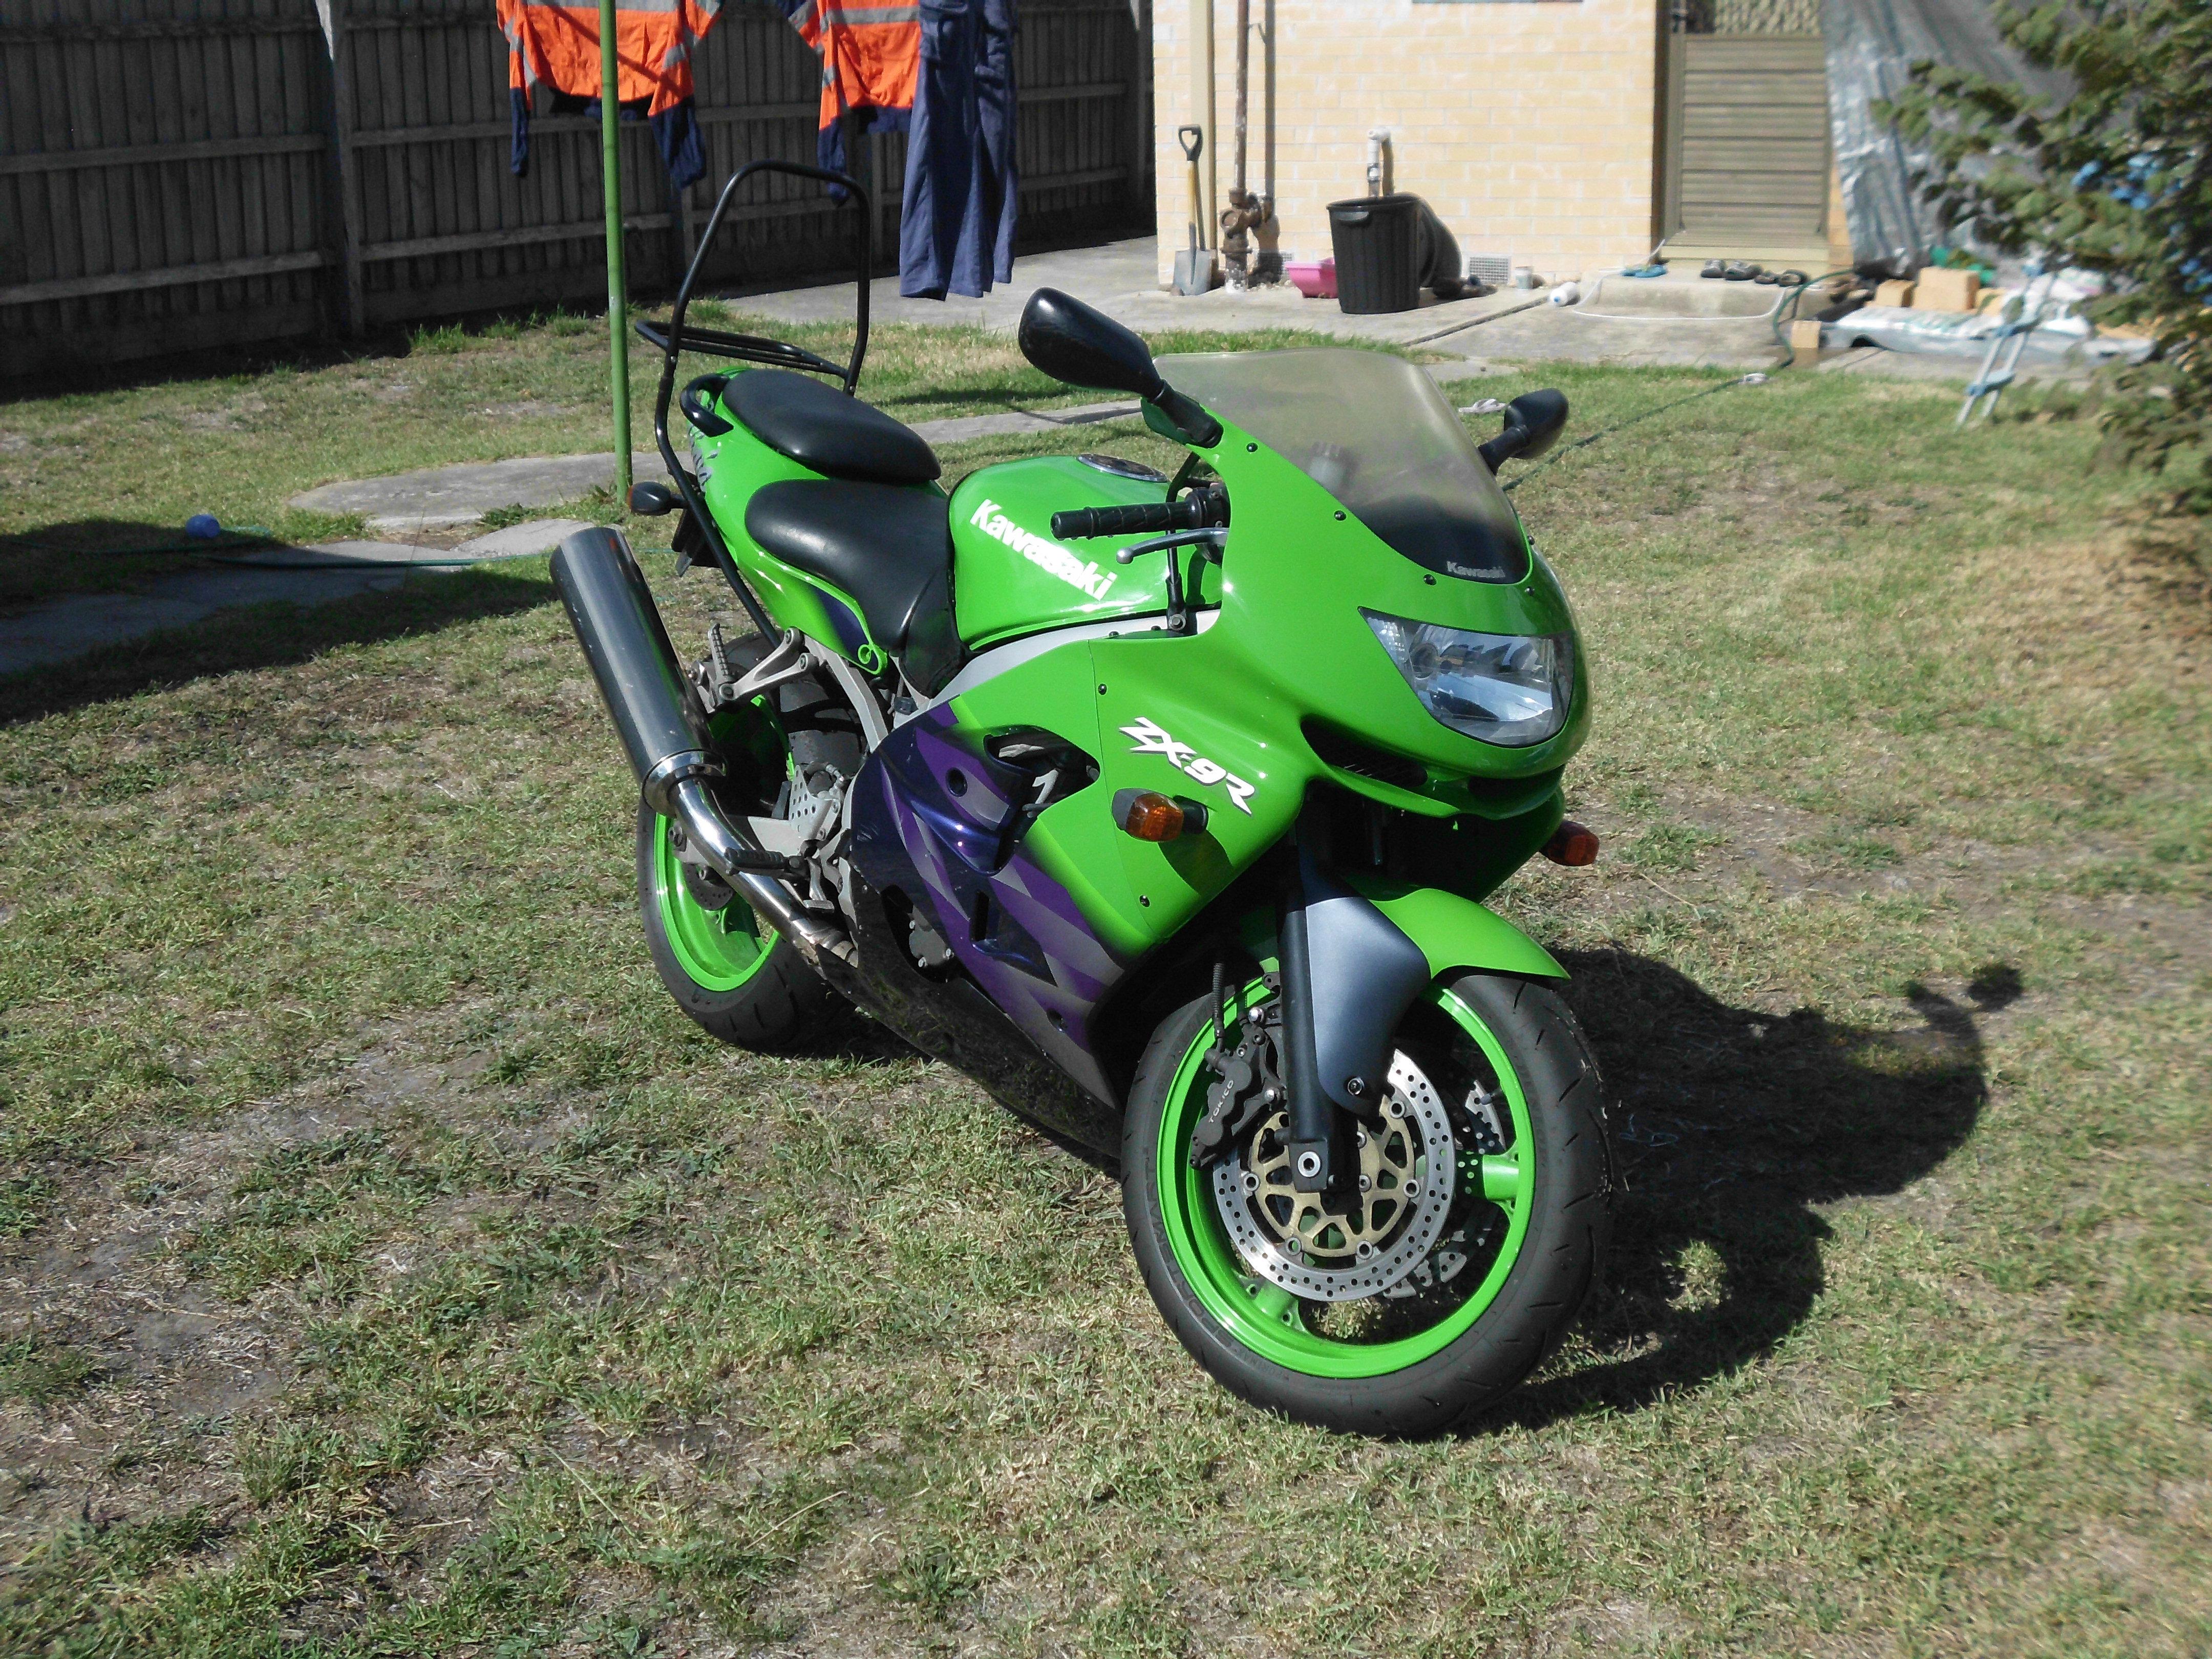 Мотоцикл Kawasaki ZX-9R 1999 Цена, Фото, Характеристики